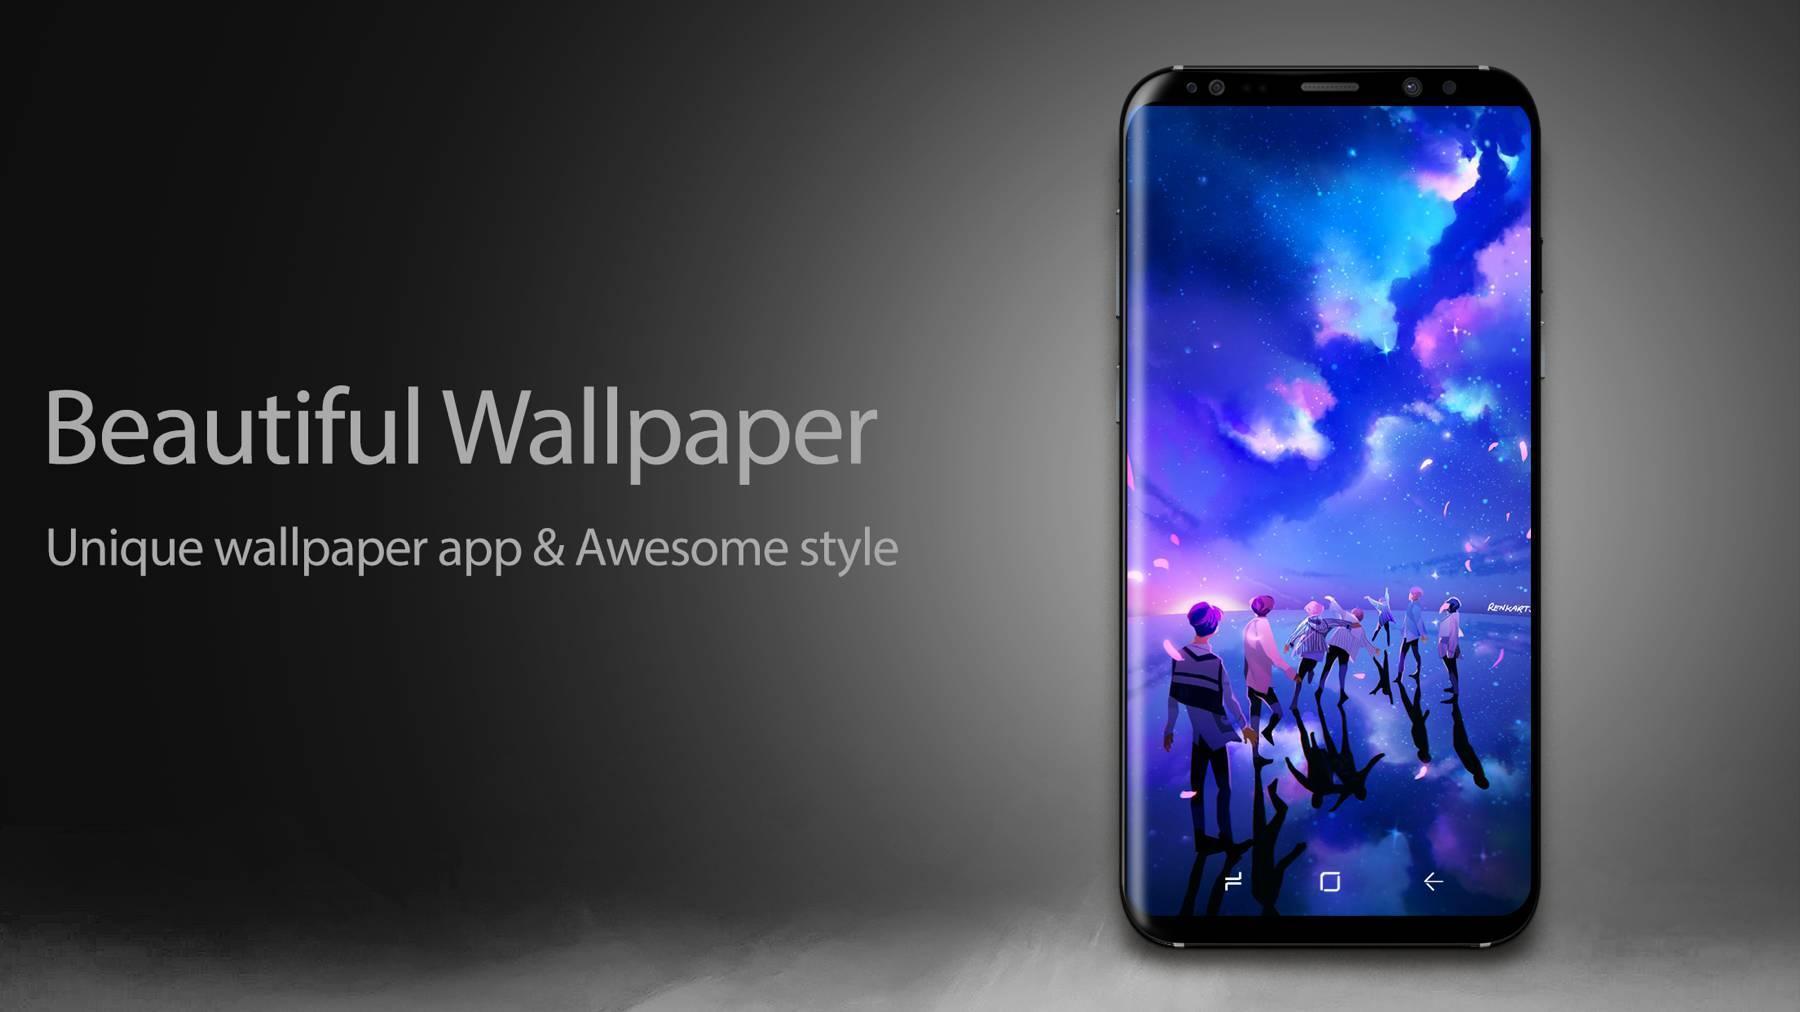 Wallpaper Lucu BTS Dan Latar Belakang For Android APK Download